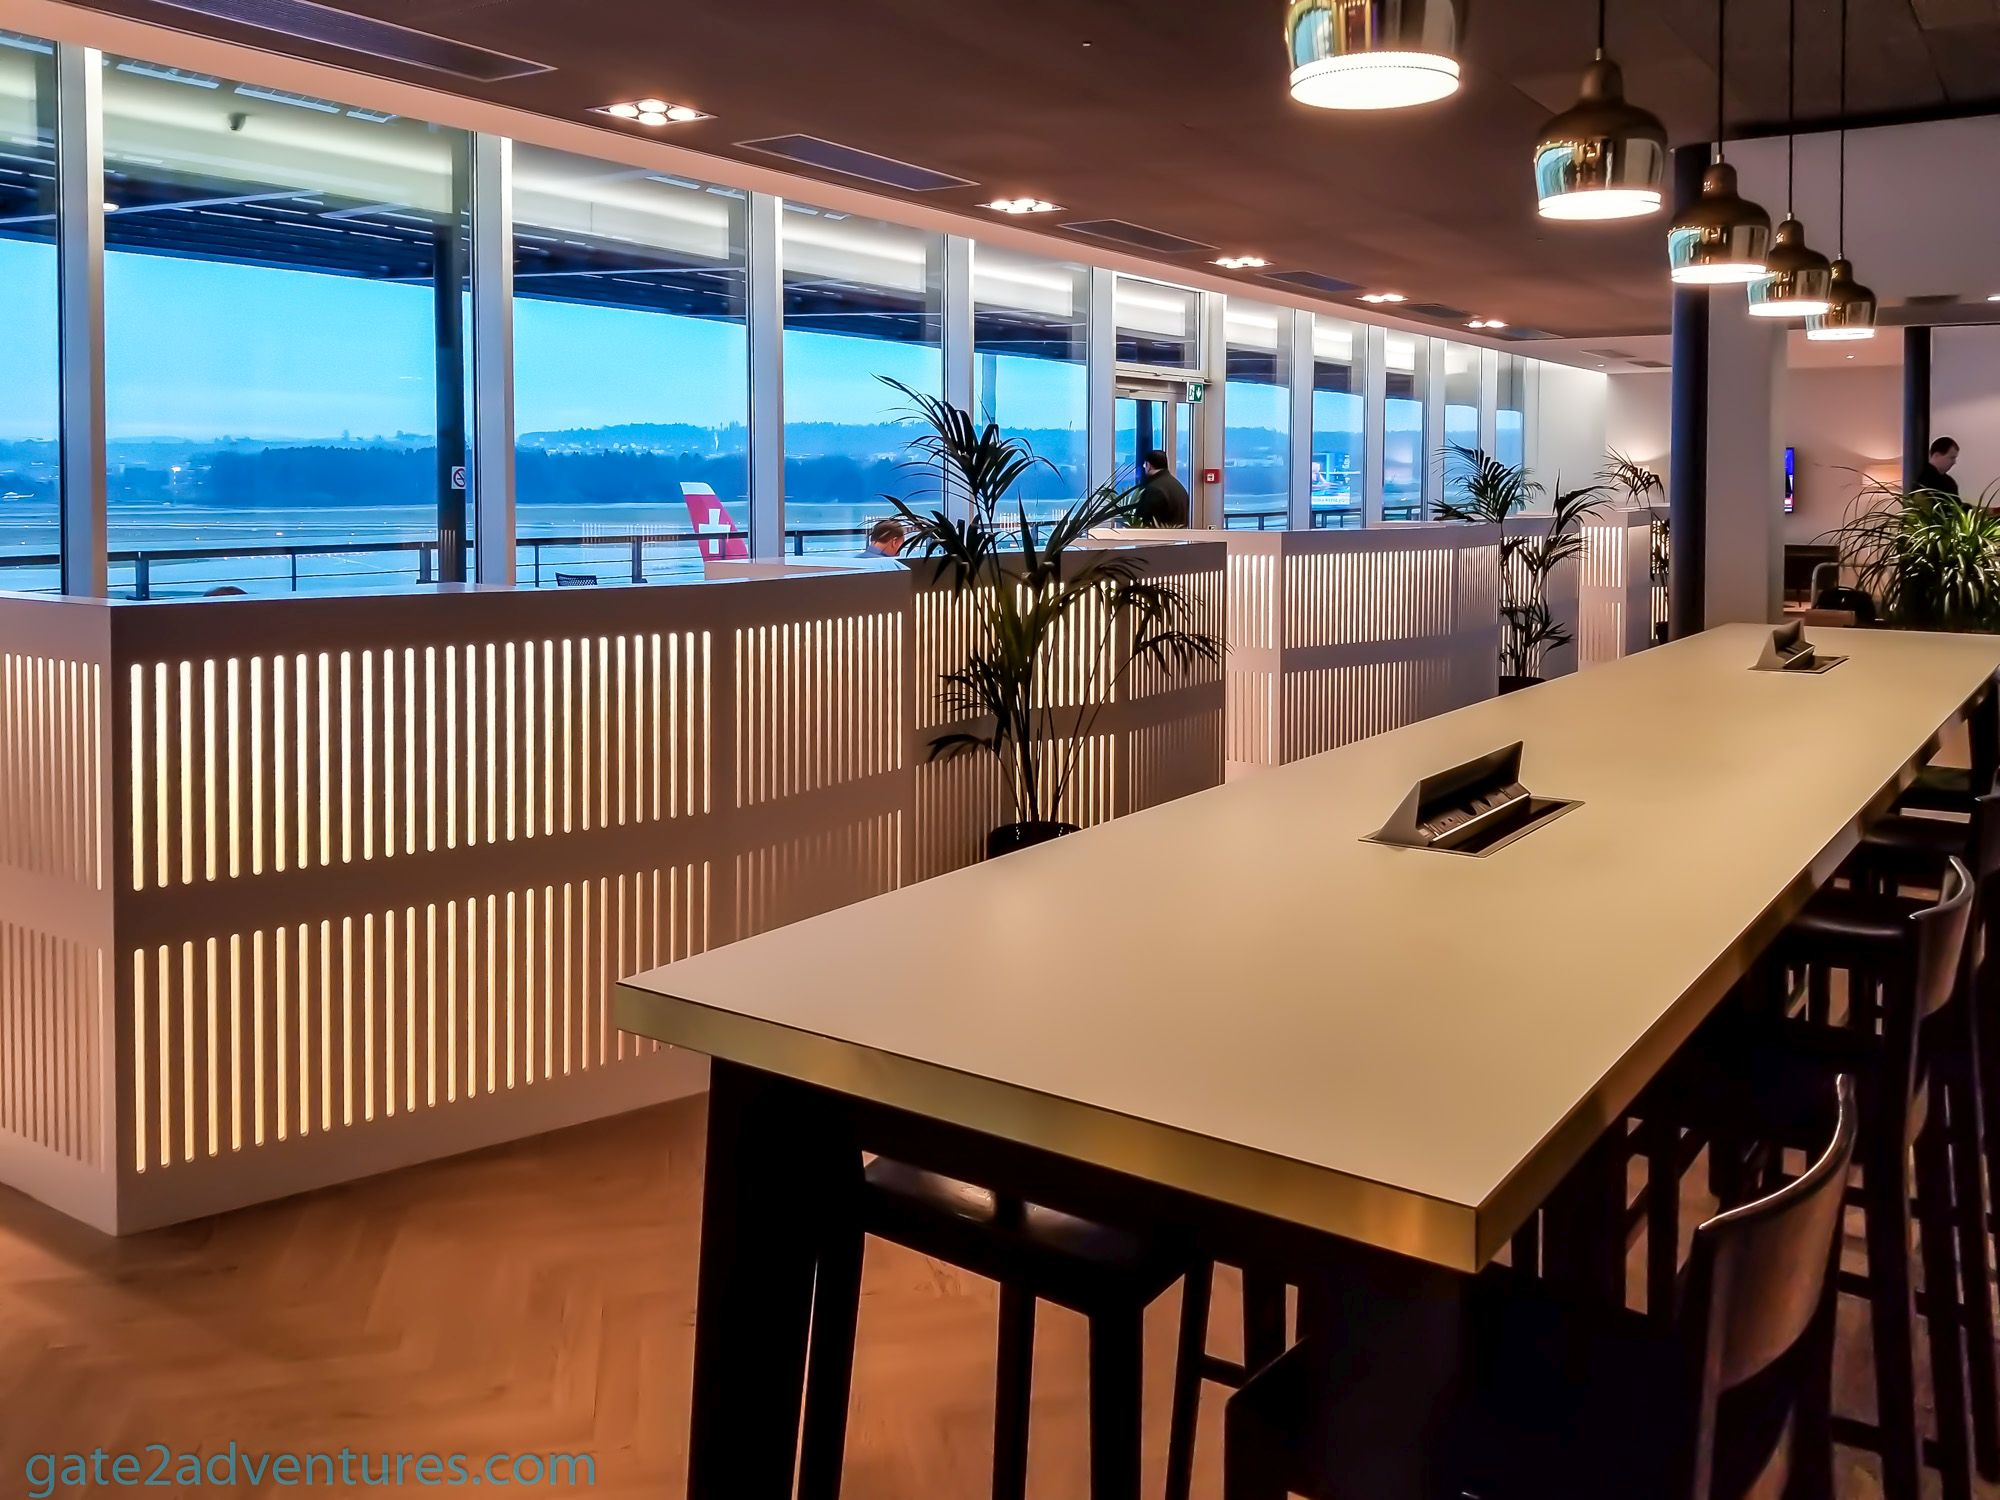 Lounge Review: Aspire Lounge Concourse E – Zurich International Airport (ZRH)